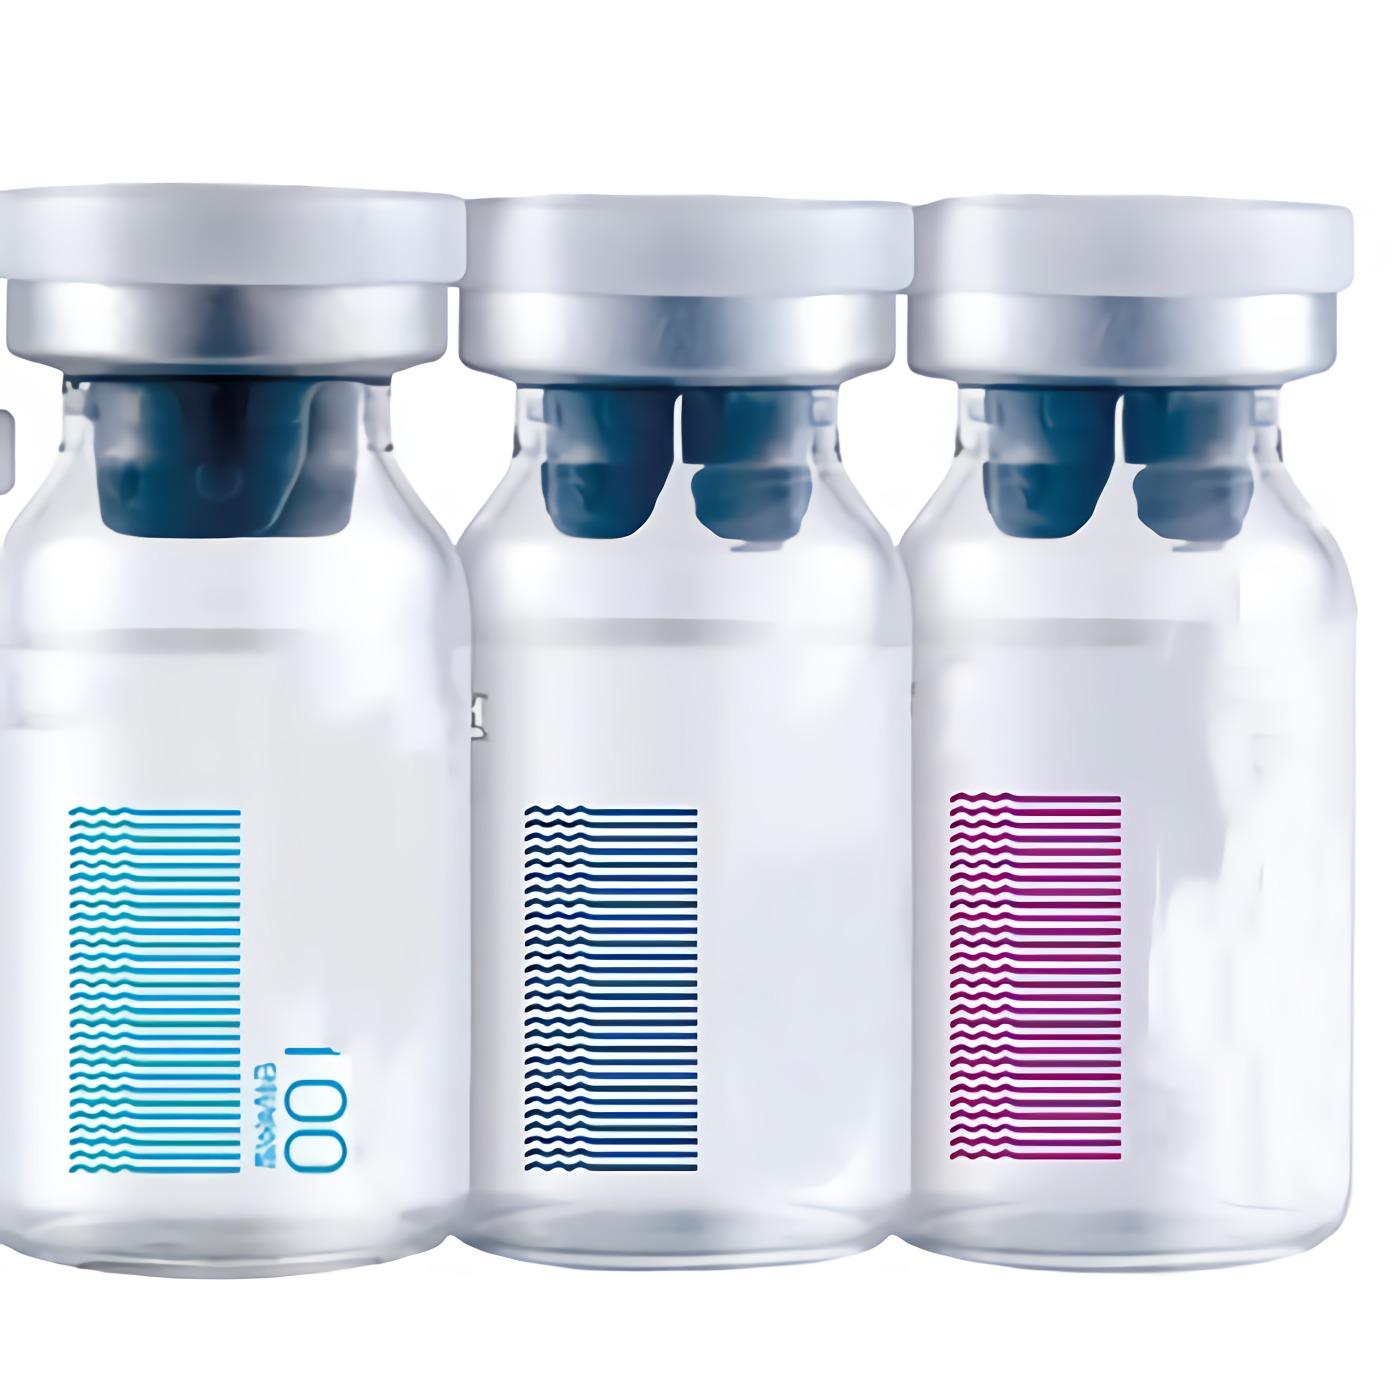 2020 High Quality dermal filler btx injections Hyaluronic acid